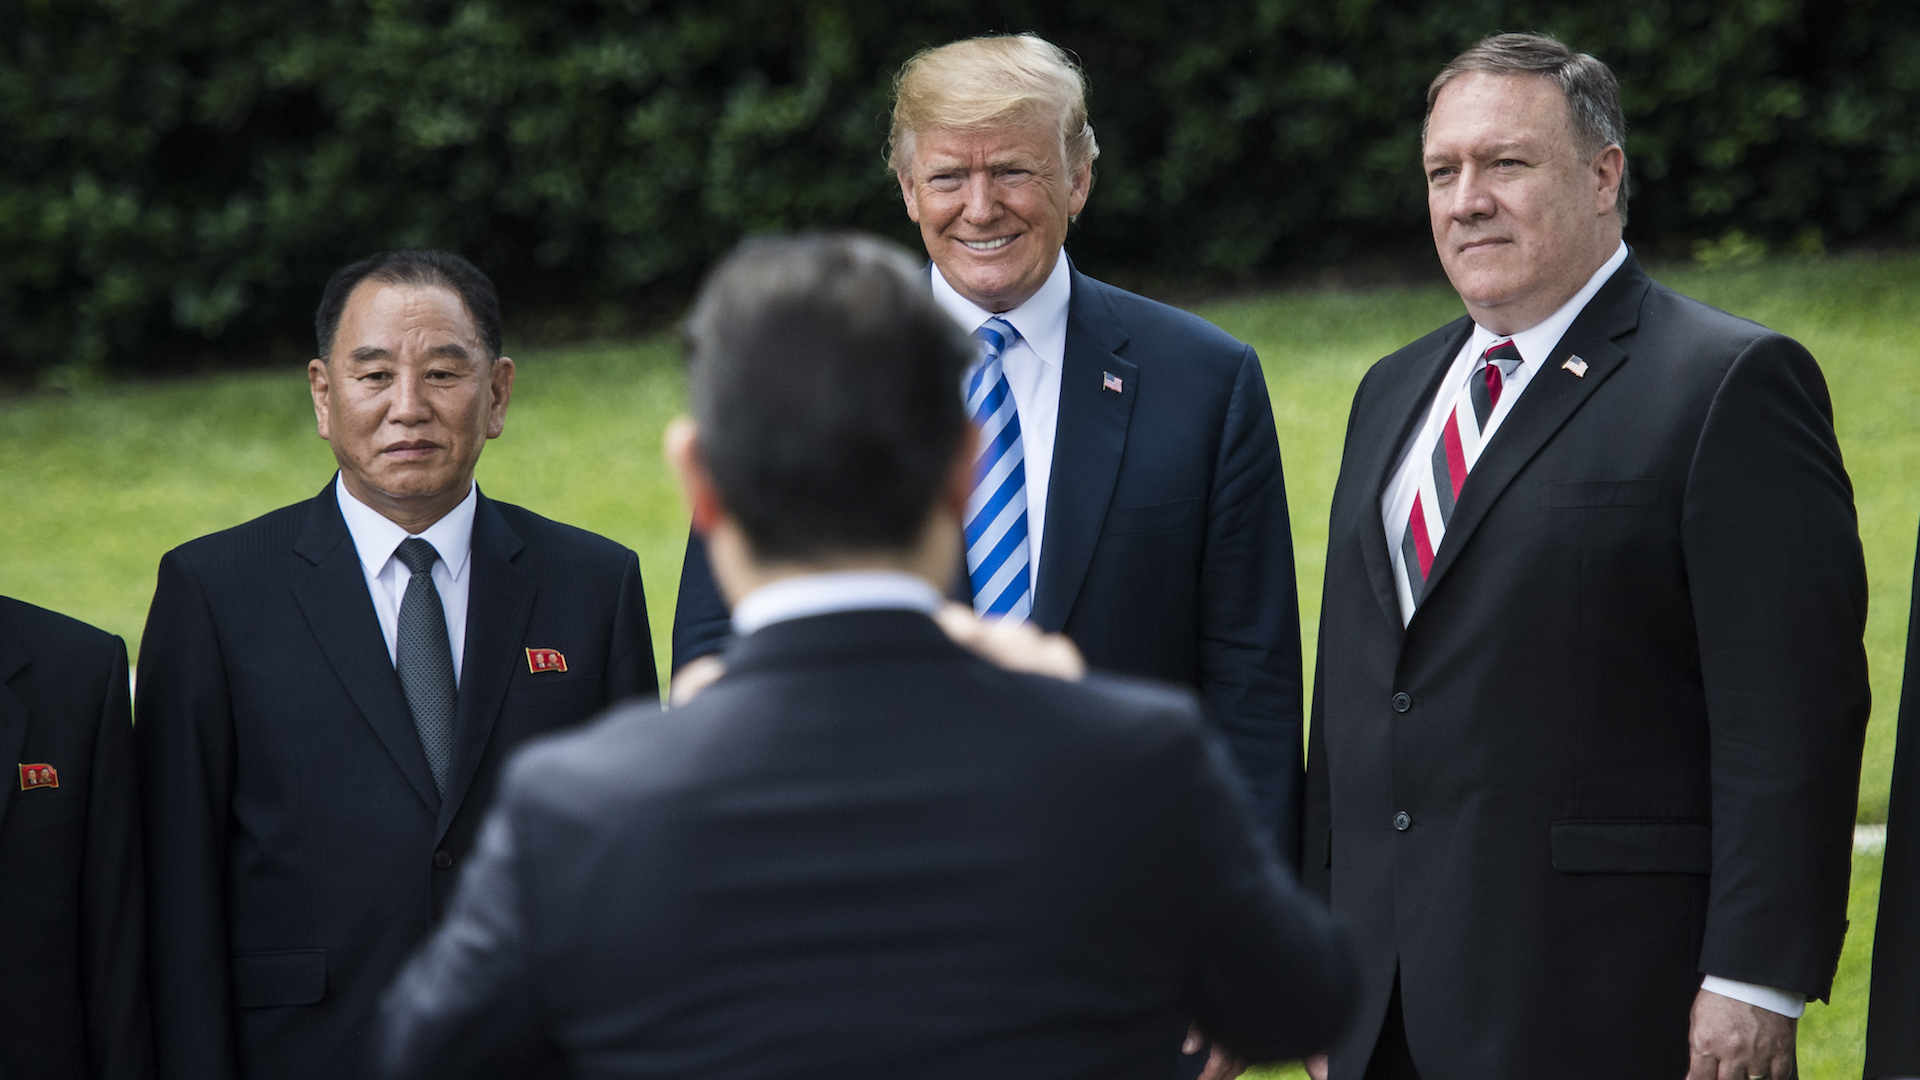 'Speed dating': Critics worry Trump is already handing propaganda victories to North Korea